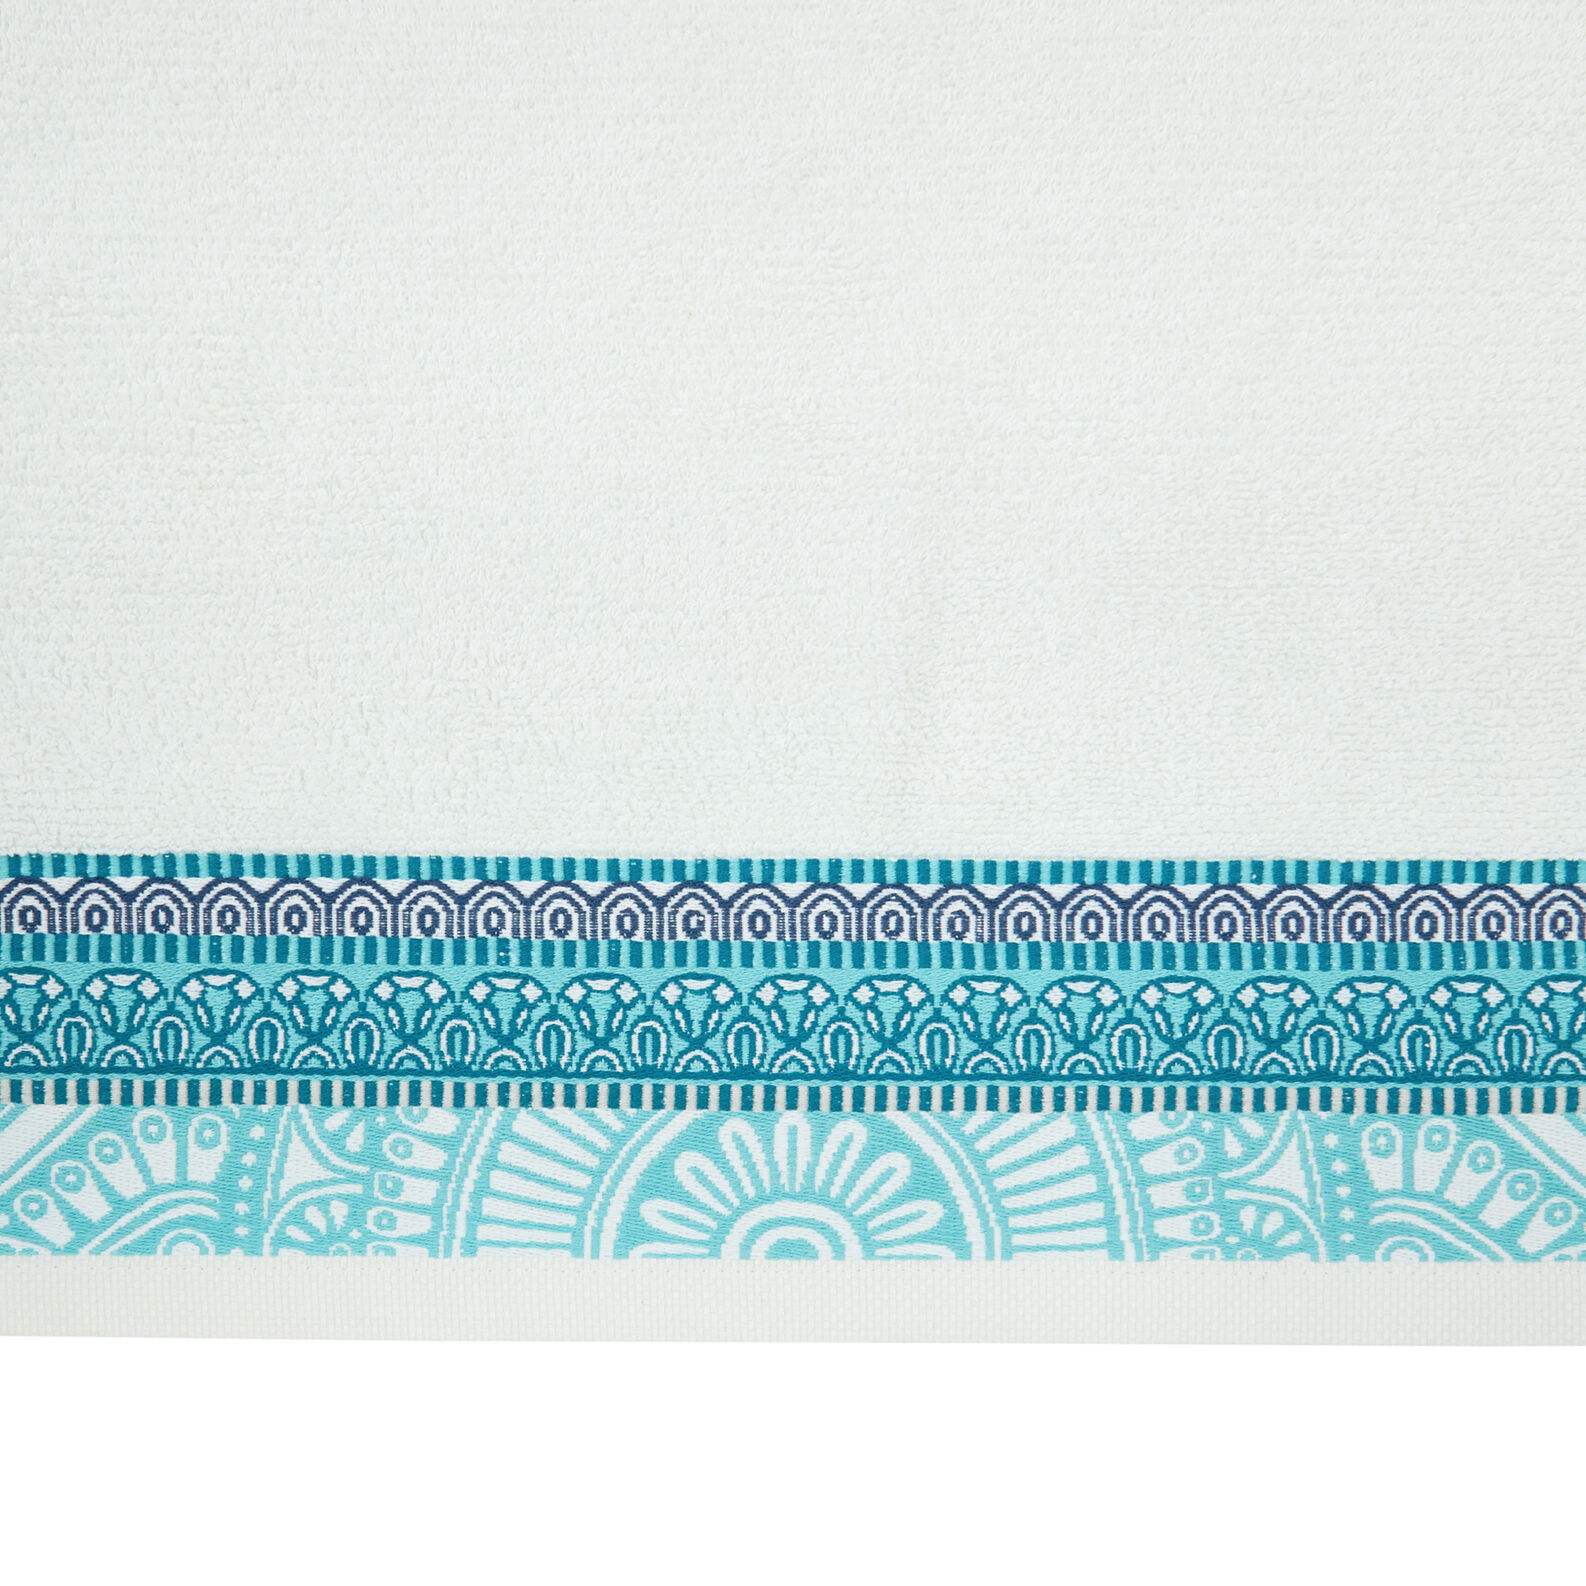 100% cotton towel with jacquard flounce